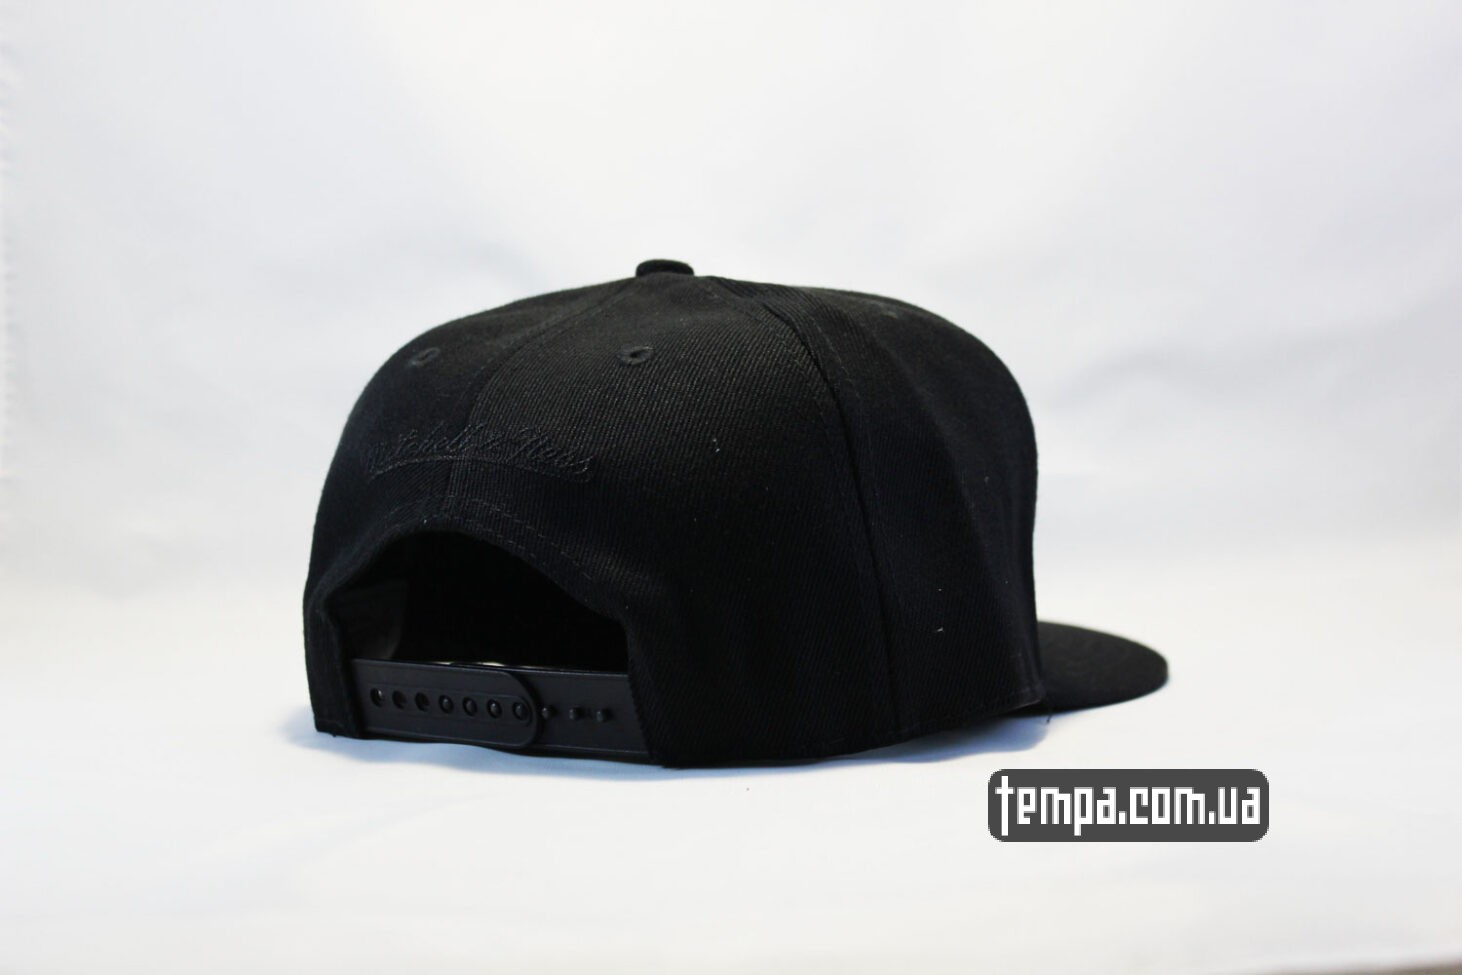 Mitchell and Ness кепка snapback Chicago Bulls black New Era черная с черным быком